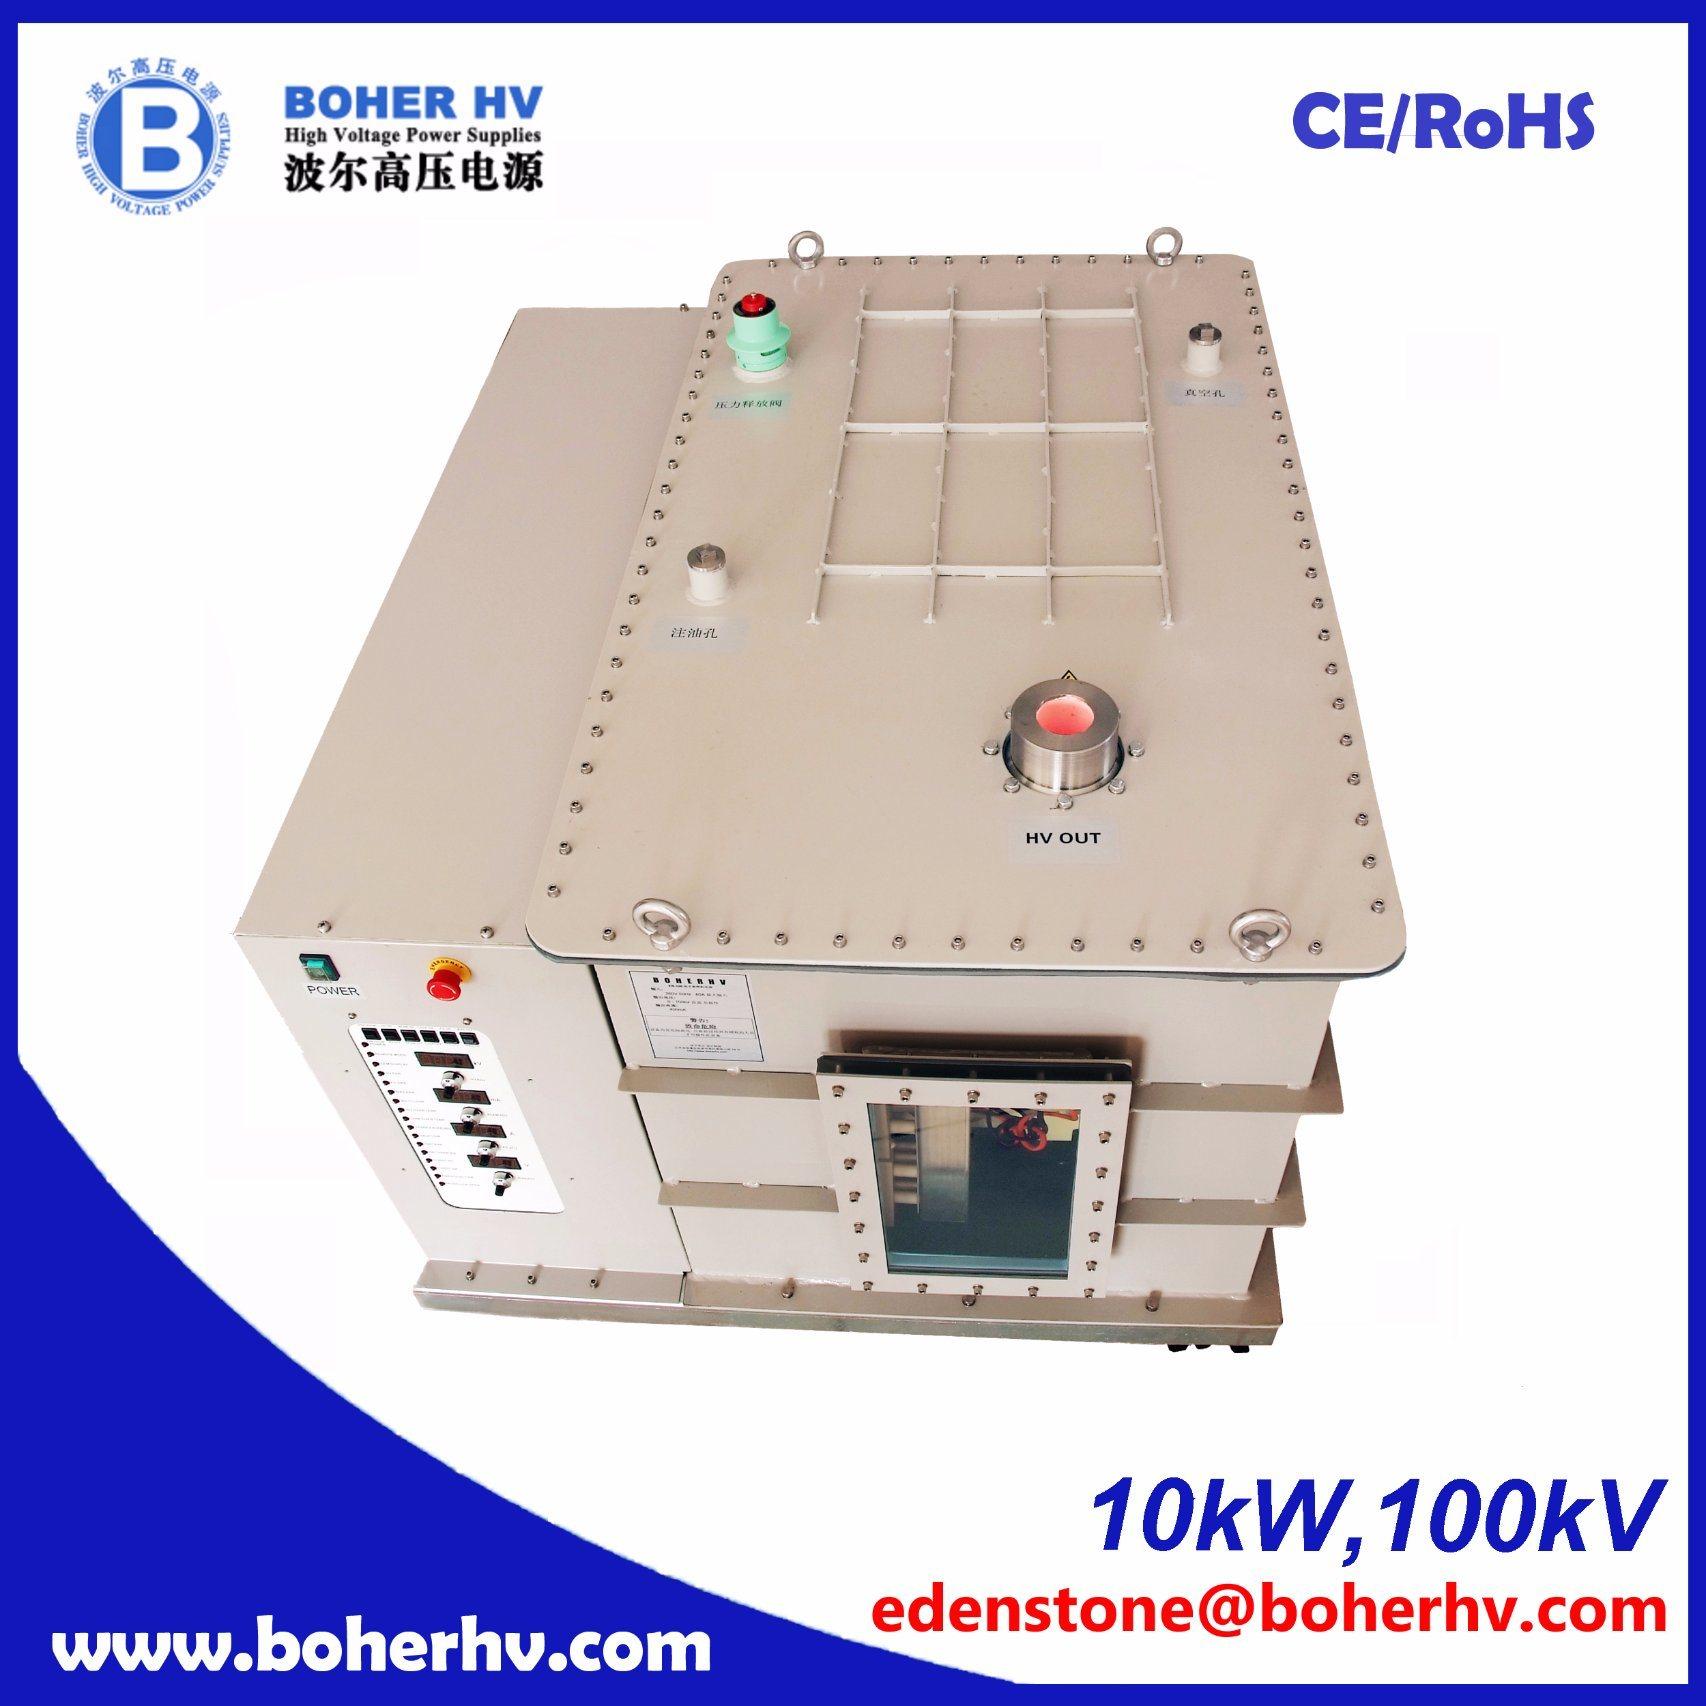 China Electron Beam Welder High Voltage Power Supply 10kw 100kv Eb 380 F30a B2kv Ebw Psu